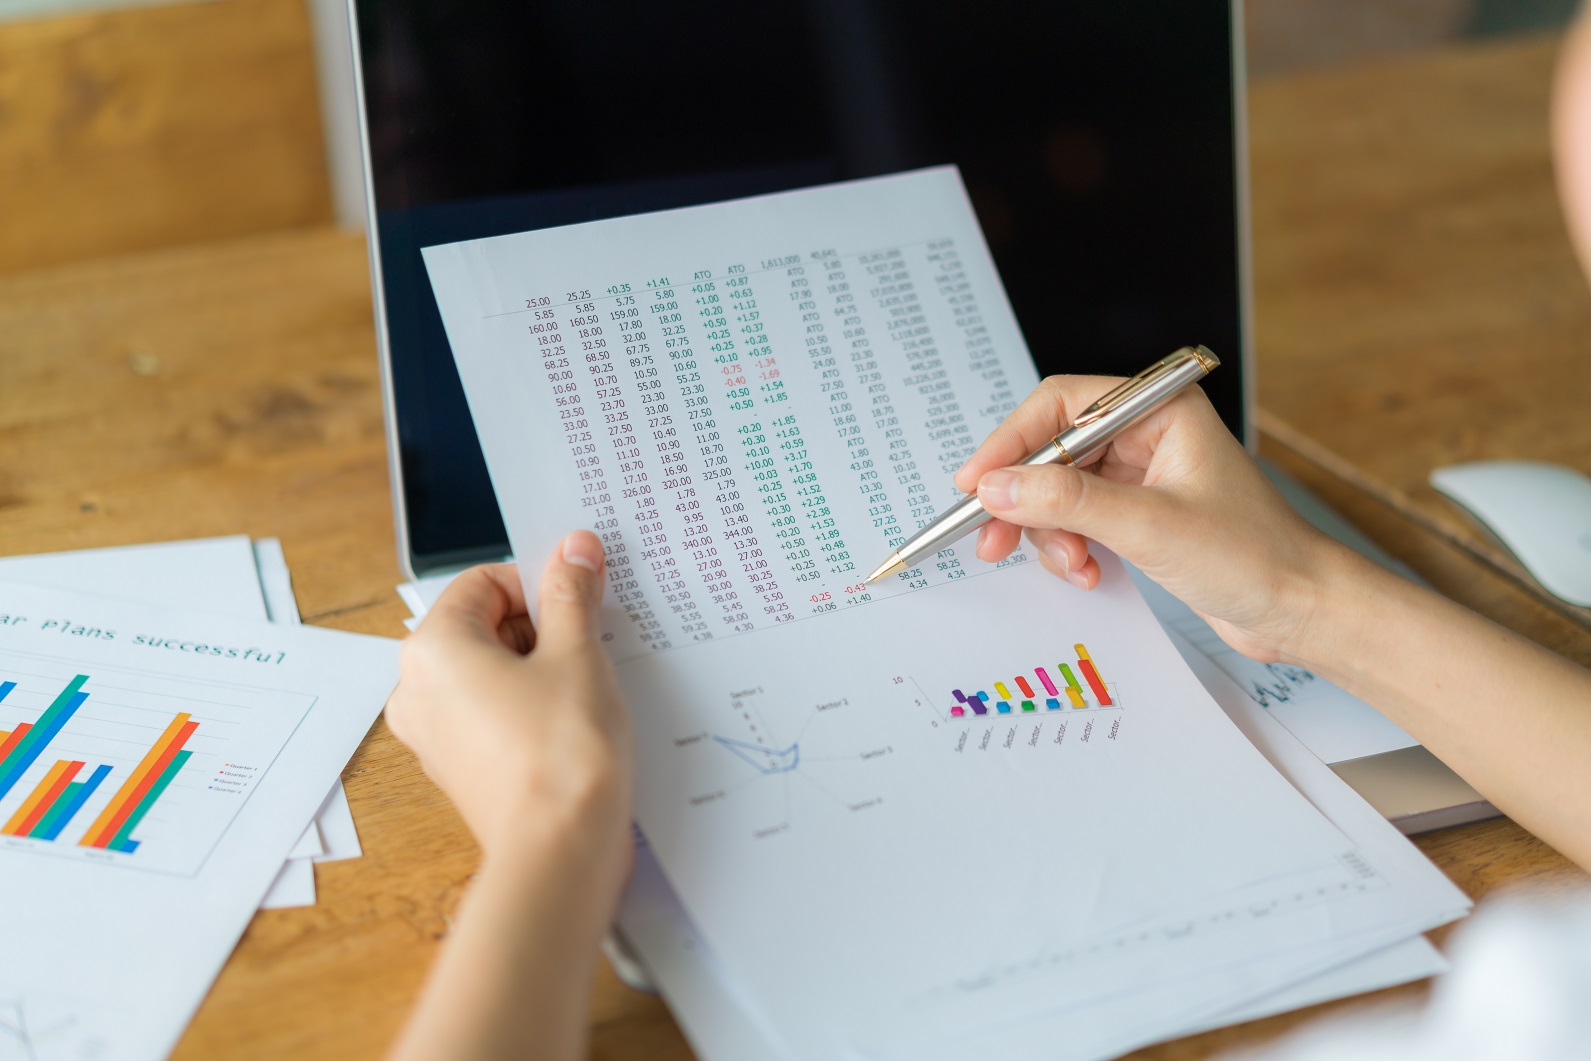 analysis-data-statistics-analyzing-price_1610121072.34.jpg